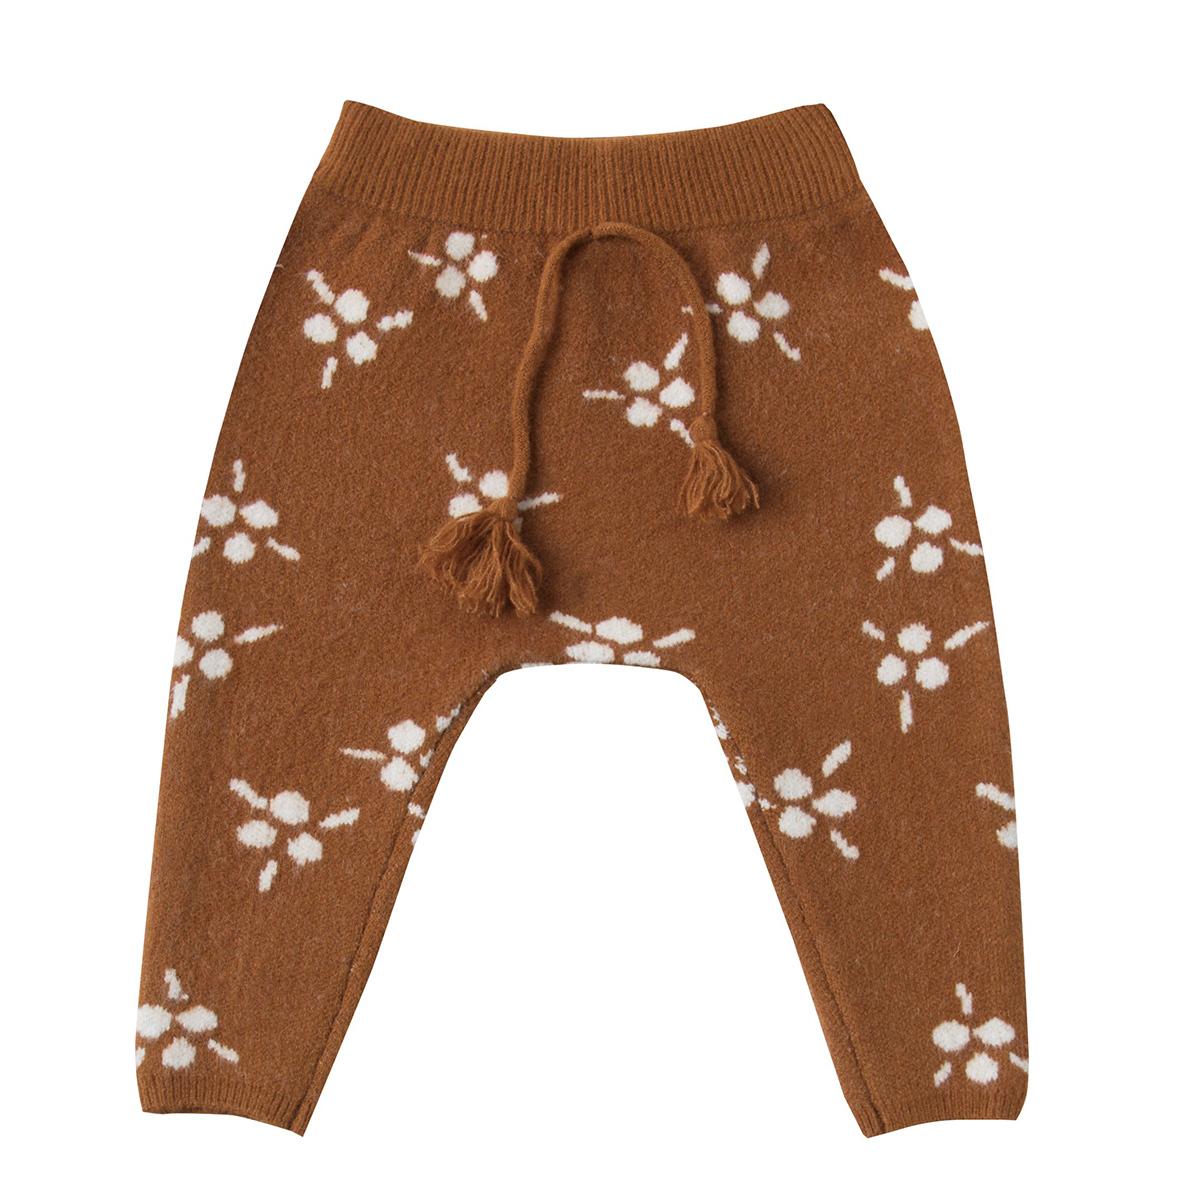 Bas bébé Pantalon Berry Jacquard Marron - 18/24 Mois Pantalon Berry Jacquard Marron - 18/24 Mois